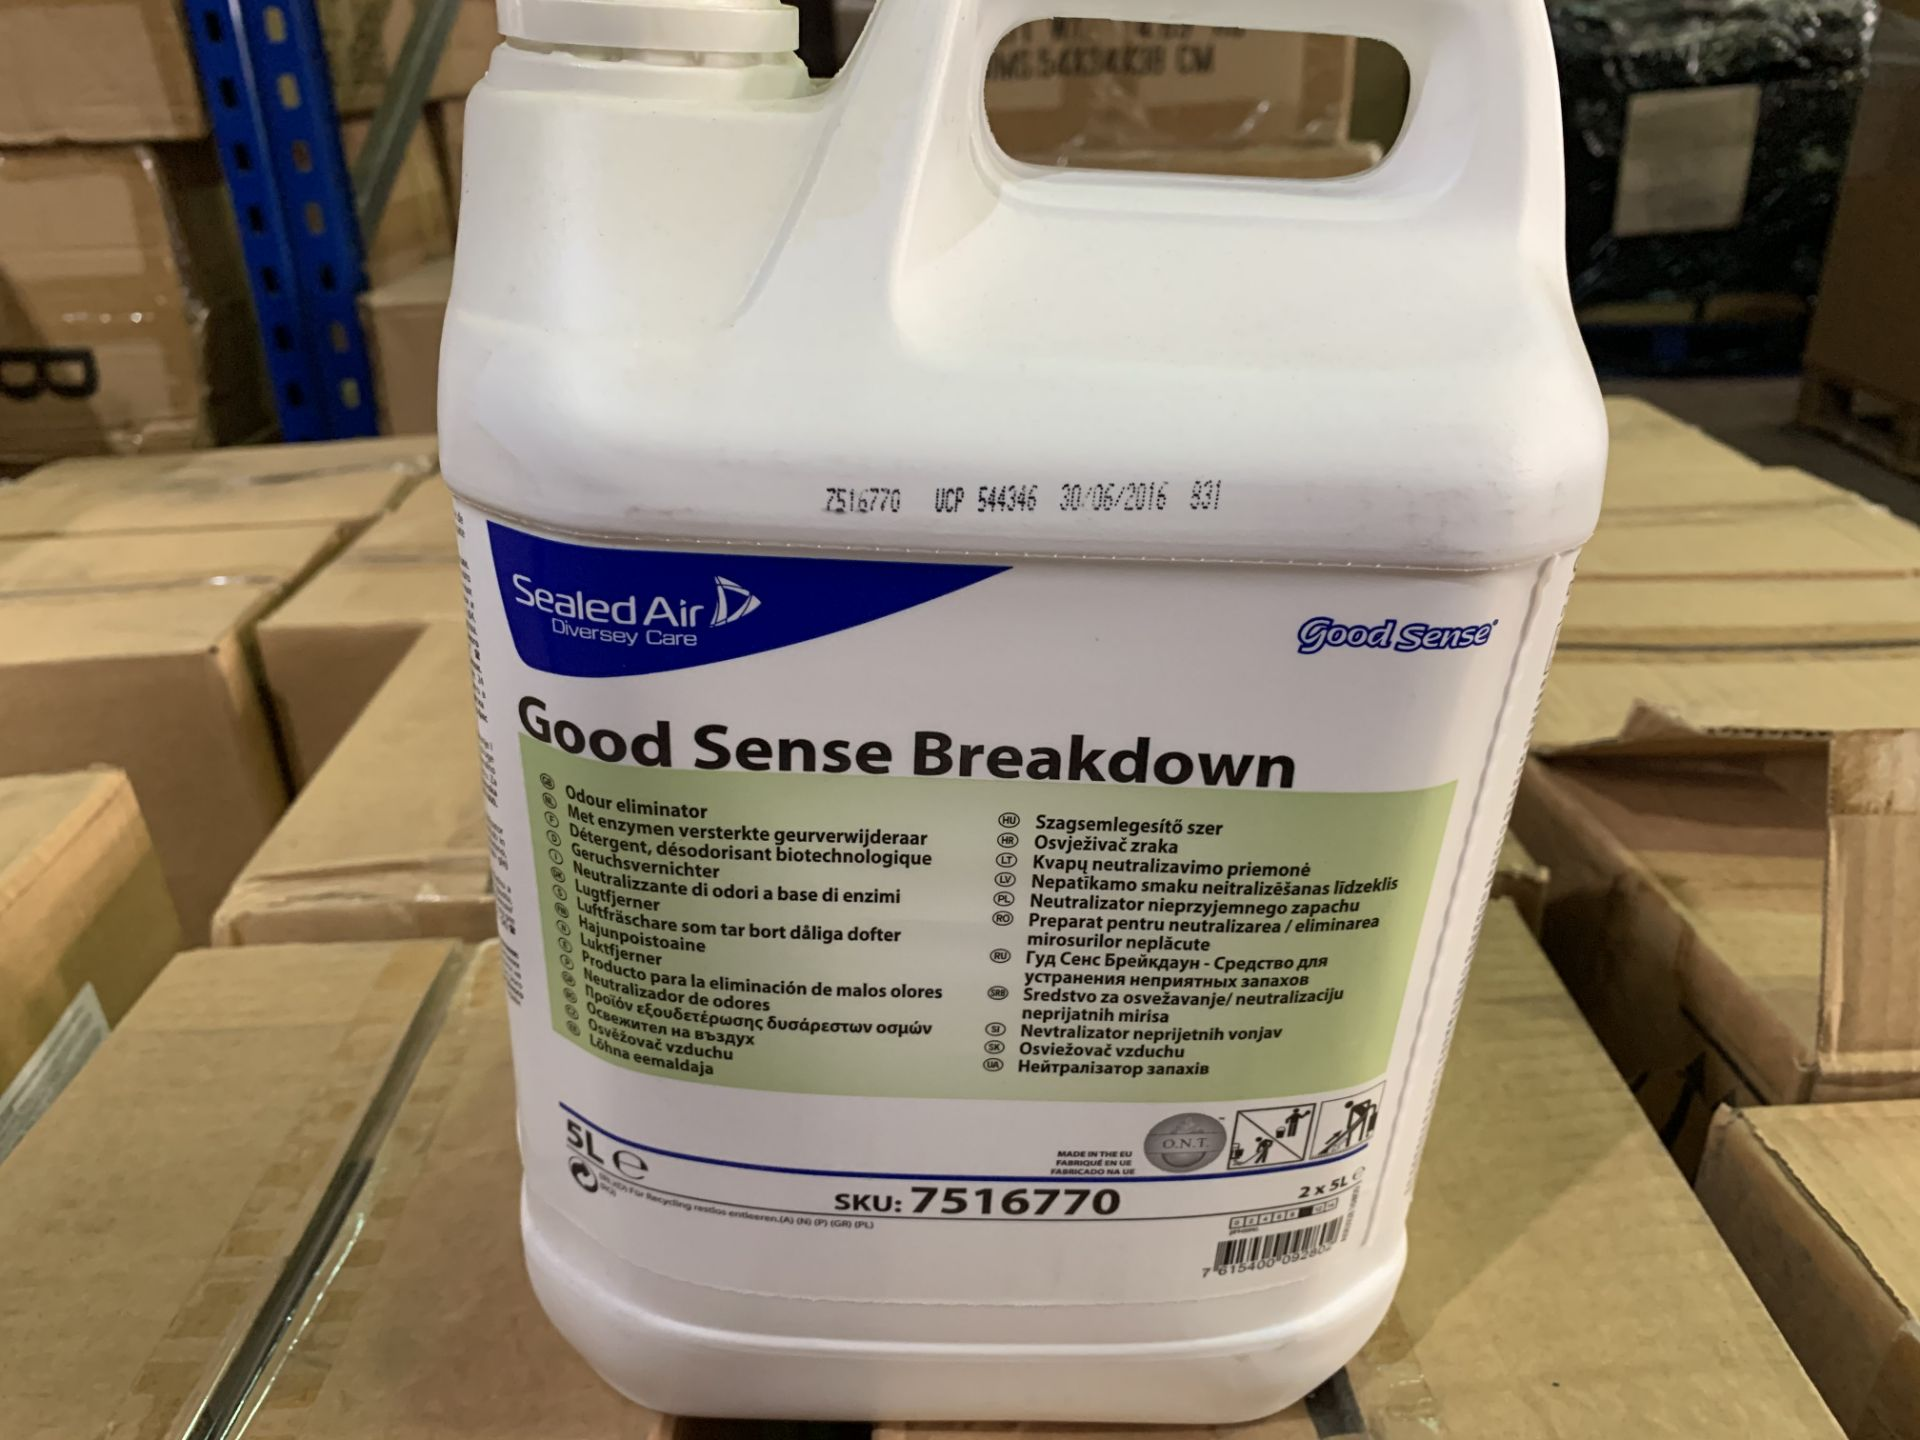 24 X BRAND NEW 5L TUBS OF DIVERSEY CARE GOOD SENSE BREAKDOWN